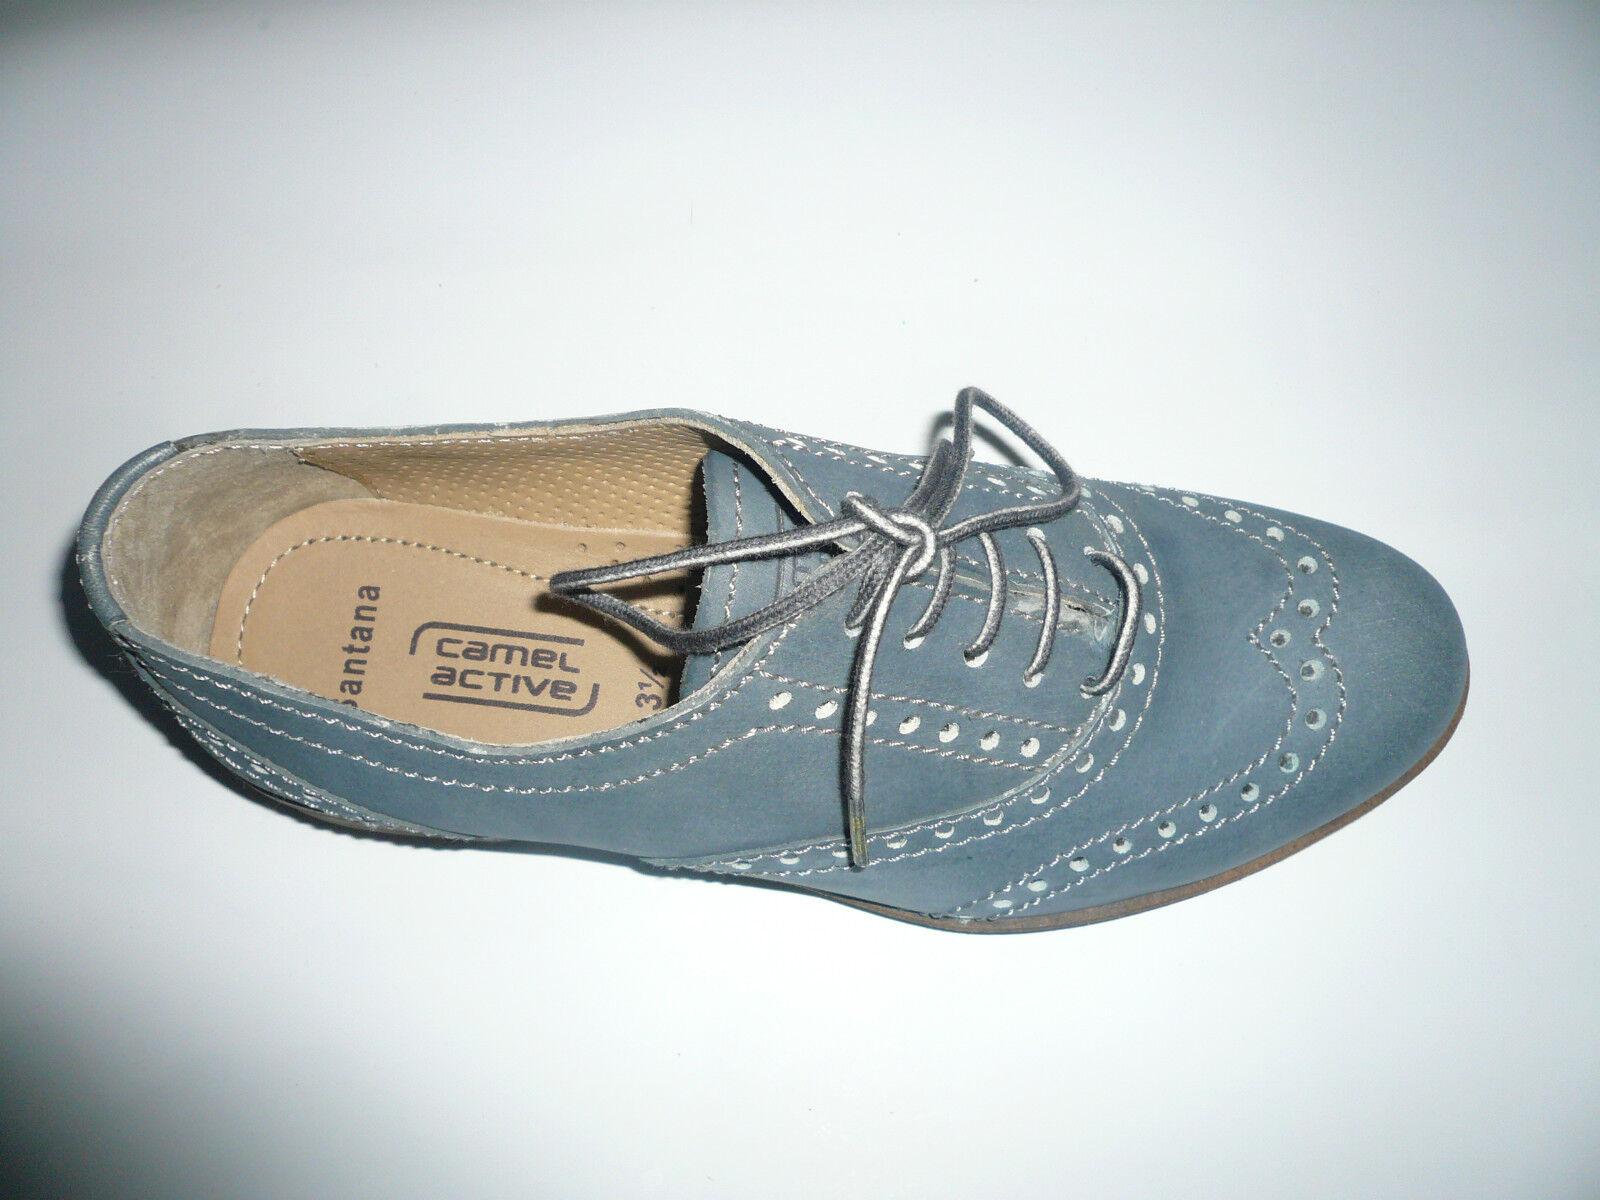 CAMEL Active Donna Mezza scarpa in blu tg. * 36+ 38,5 * 23687004 * tg. 9bce38